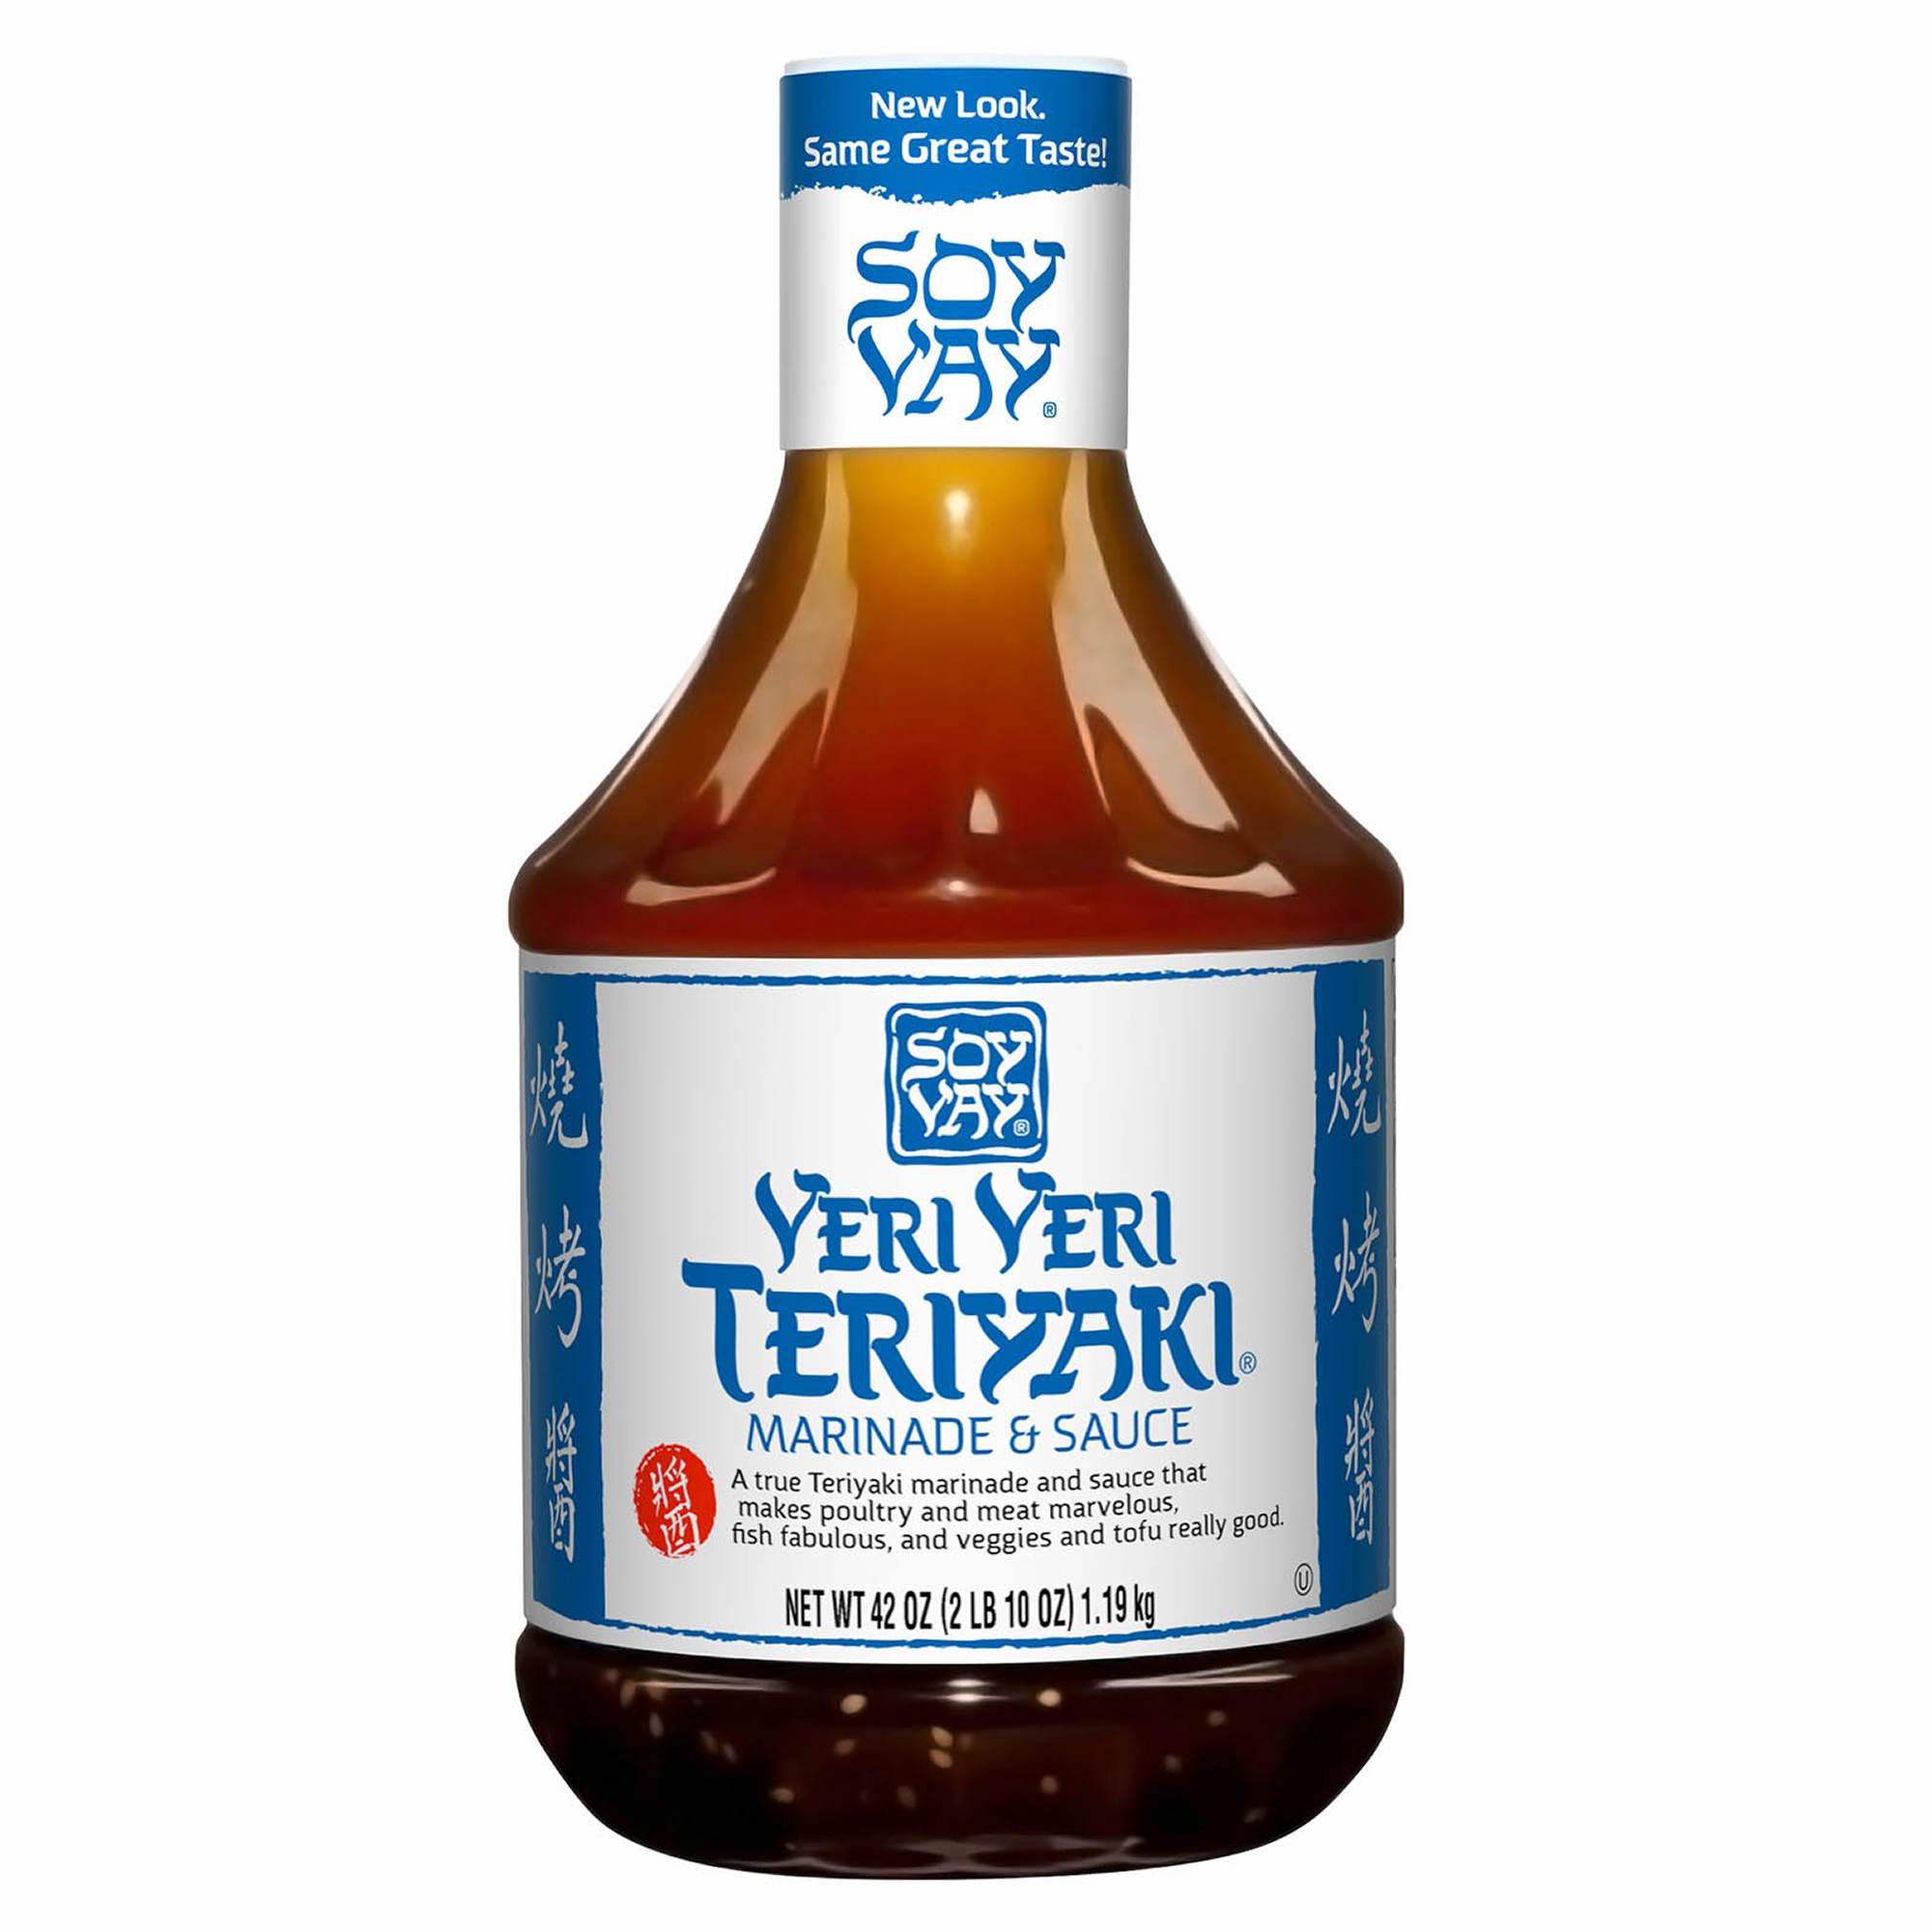 Soy Vay Veri Veri Teriyaki Sauce, 42 oz. - BJ's Wholesale Club